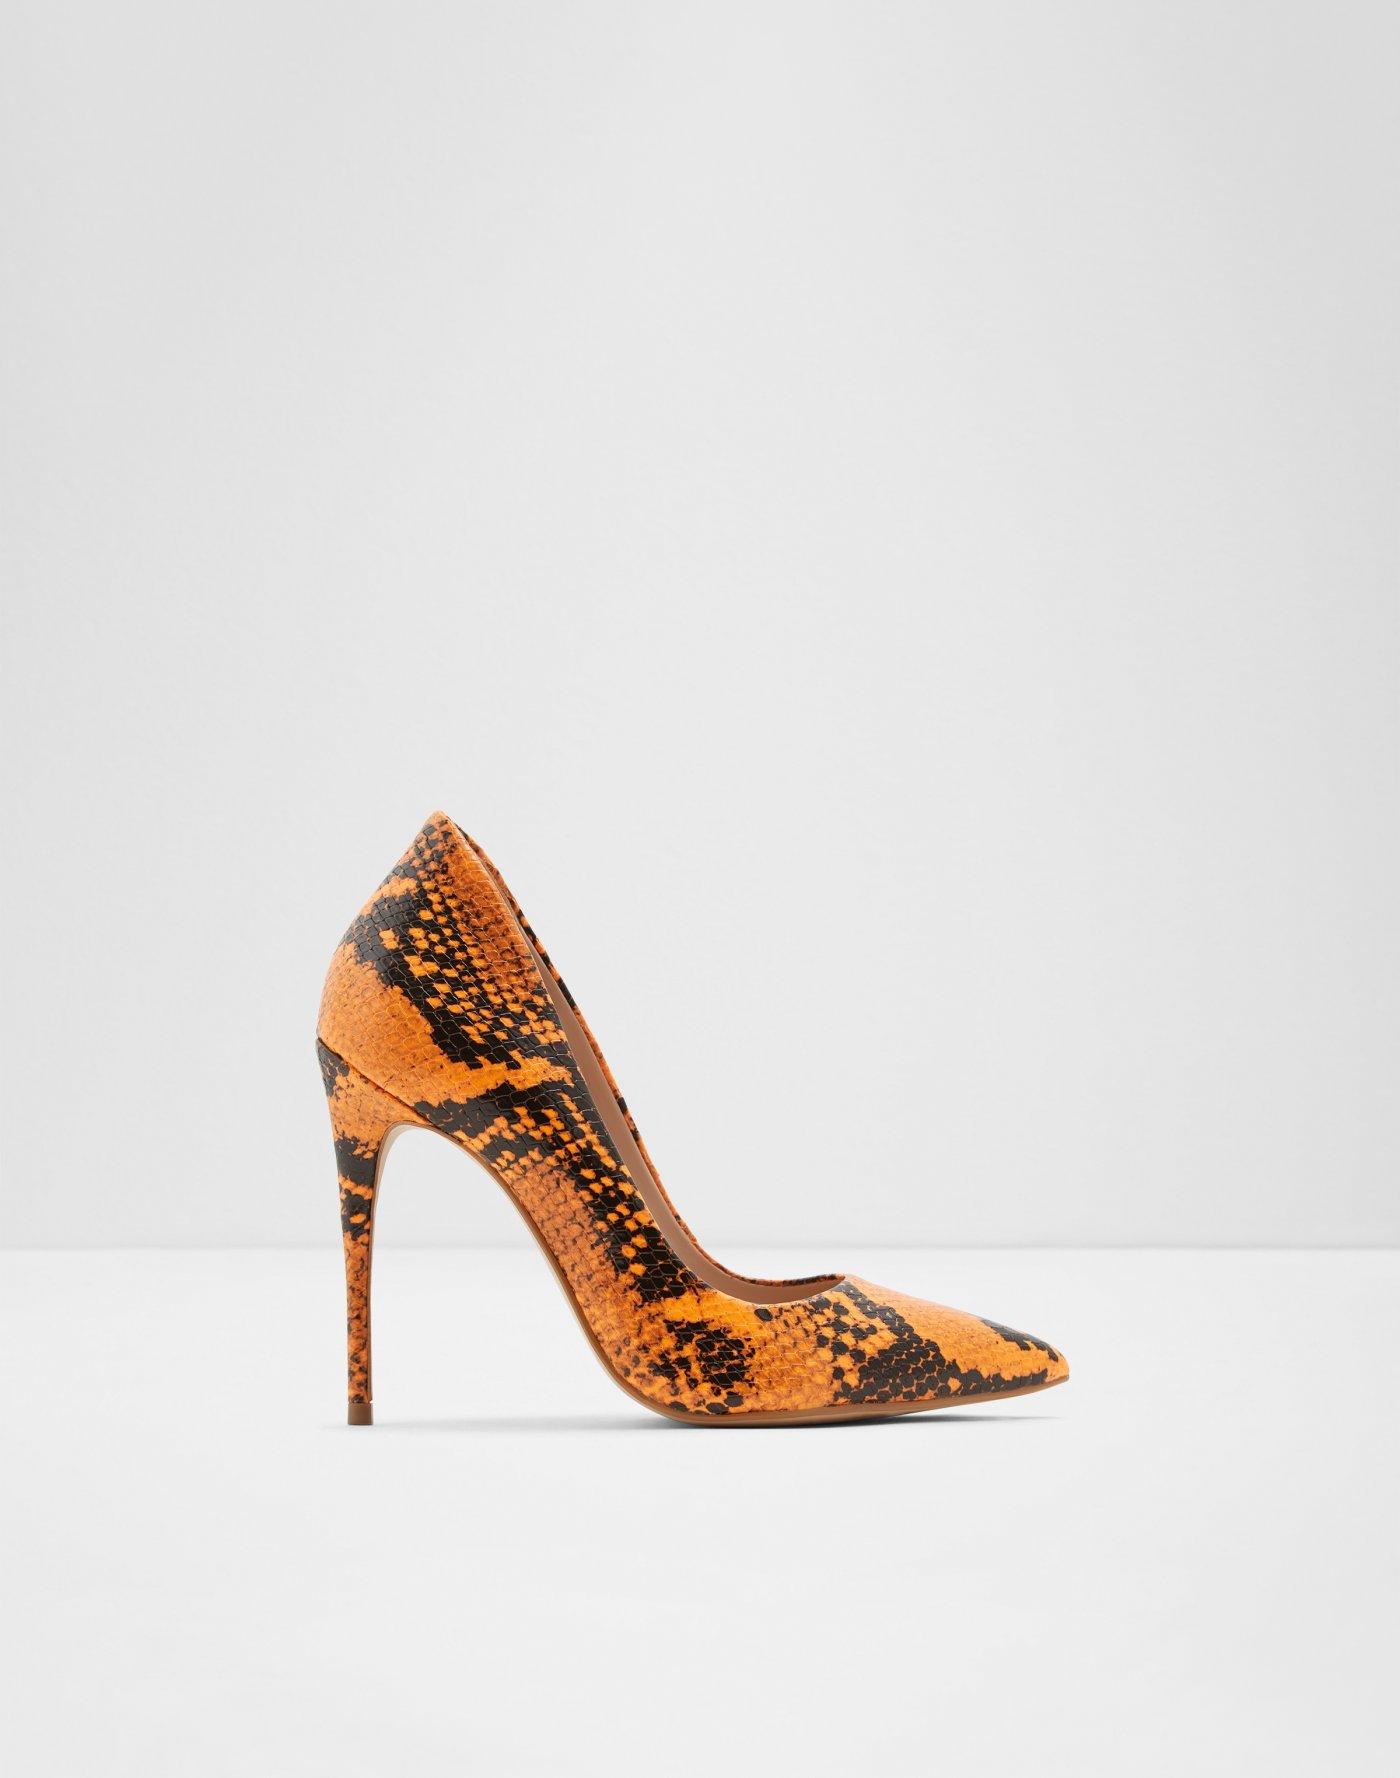 205211ffbe Heels | Aldoshoes.com US